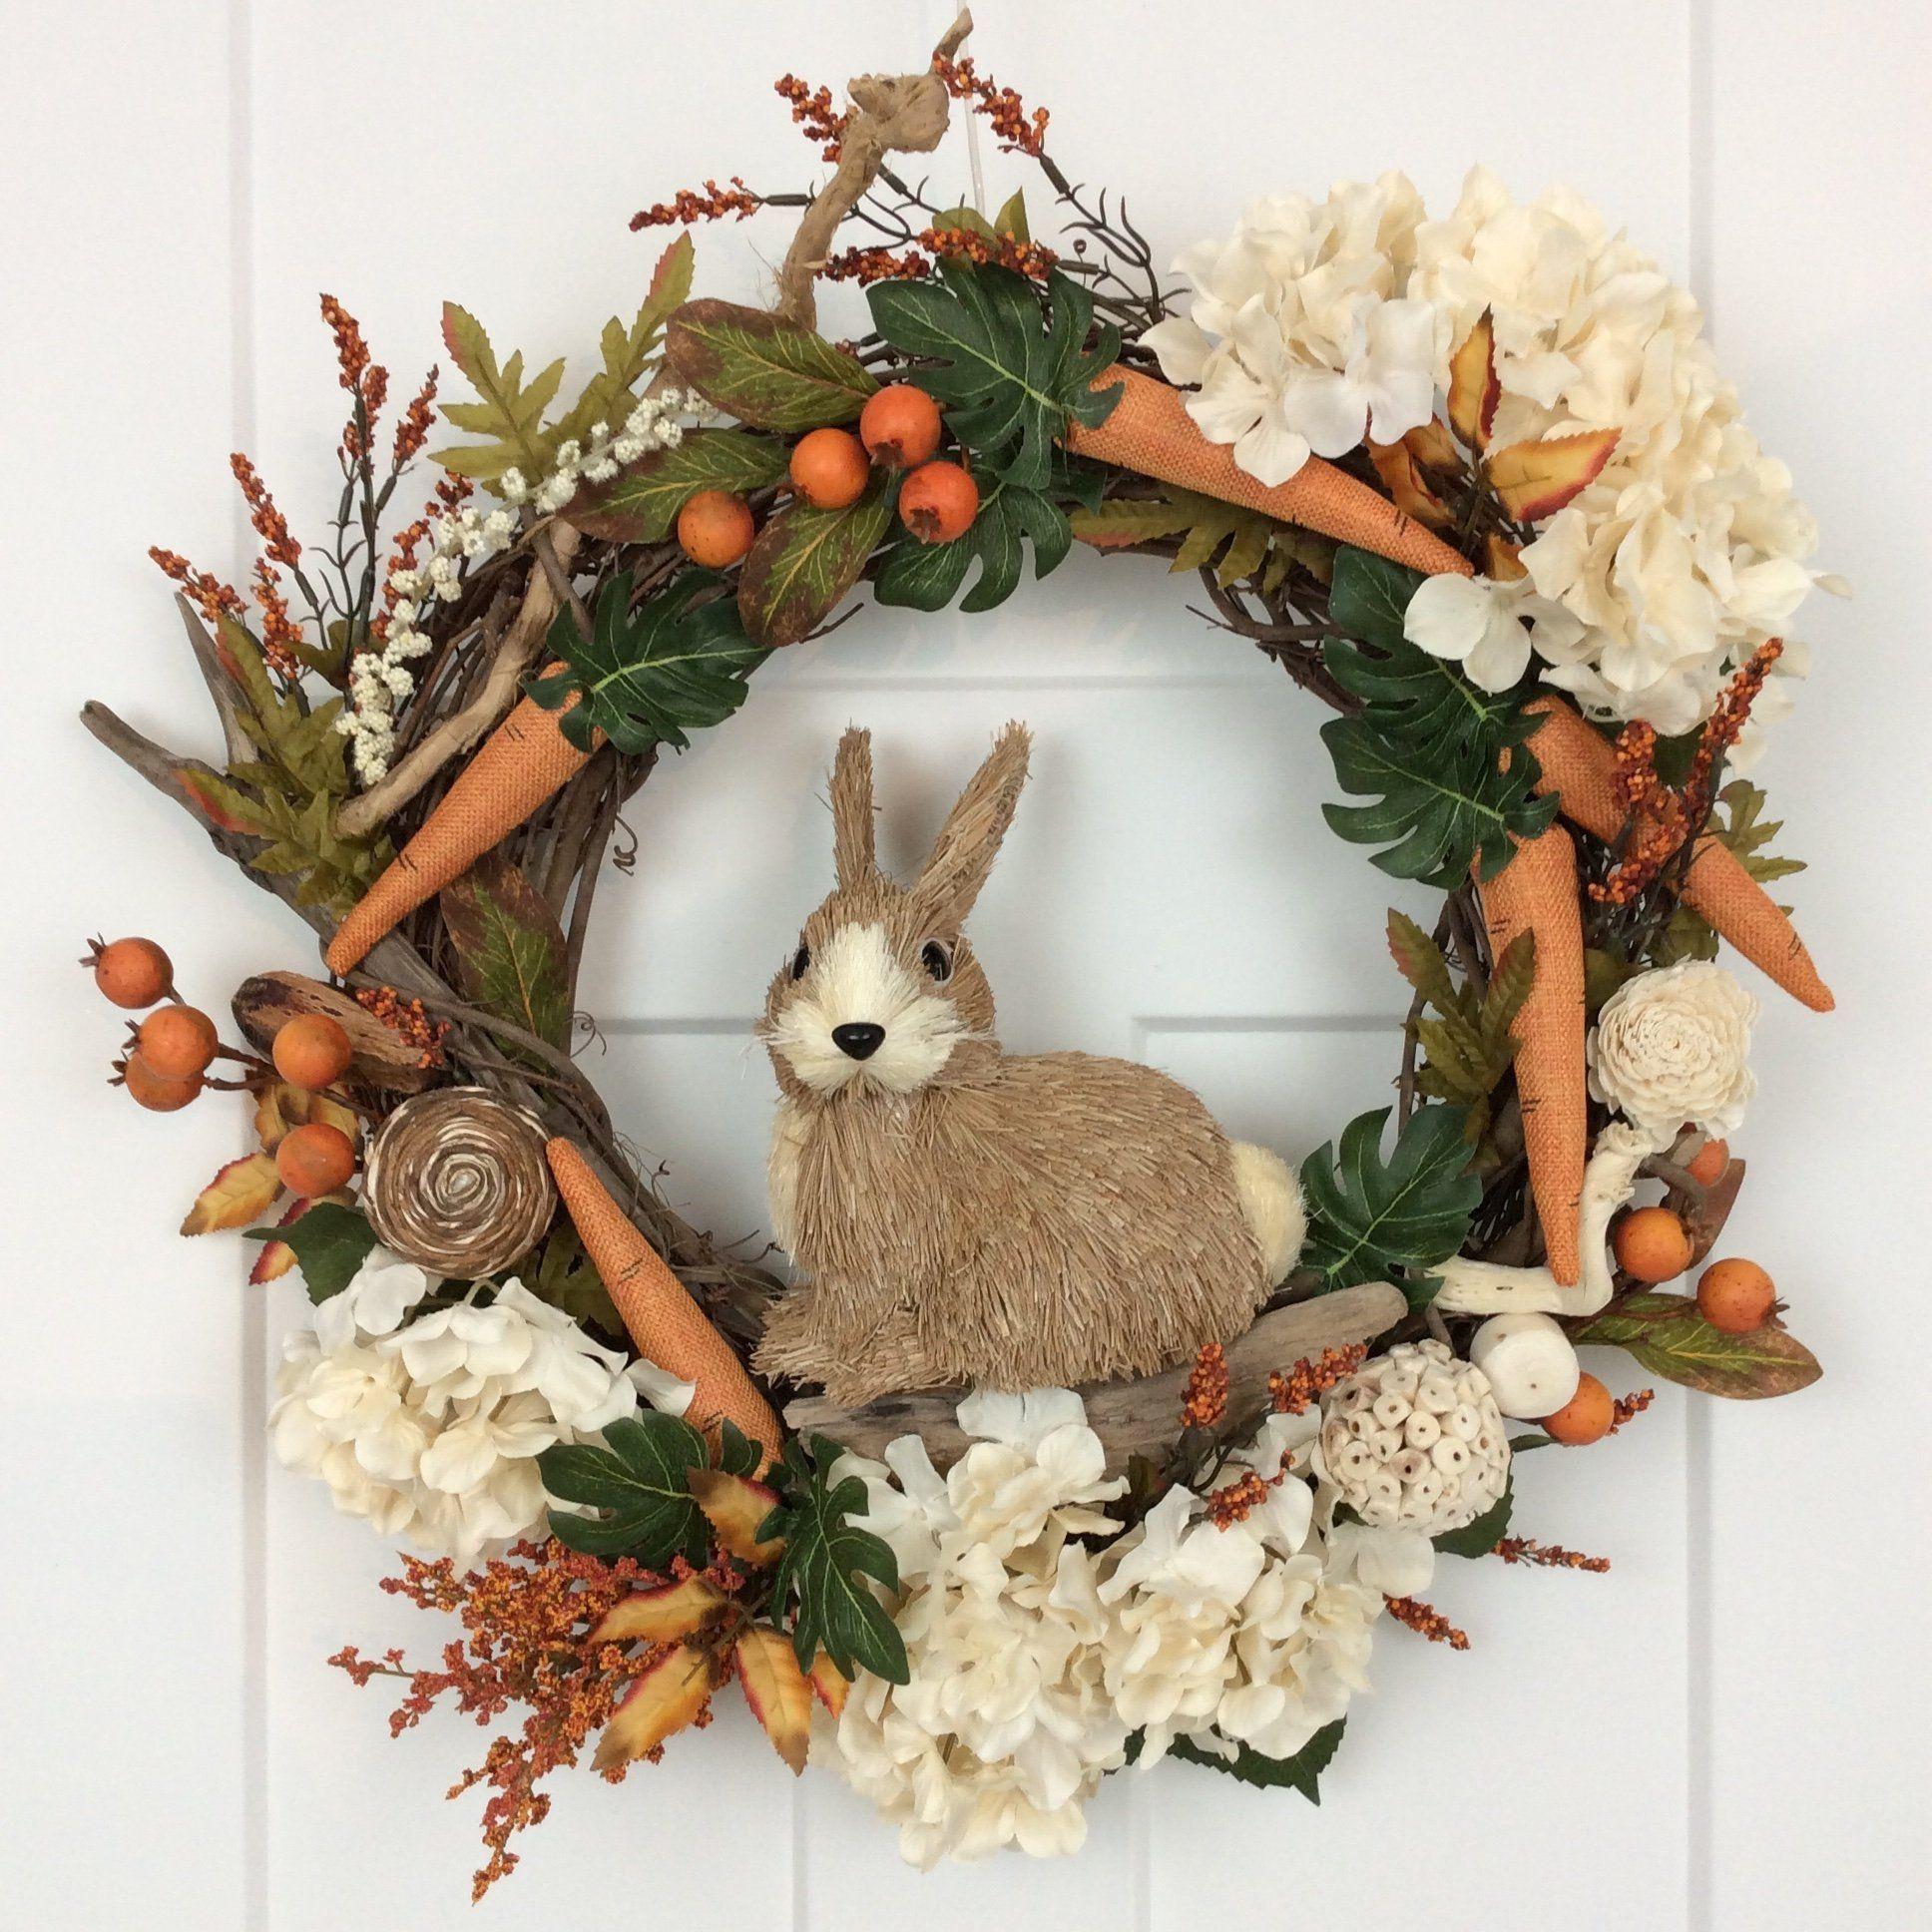 Photo of Wildlife Wreath, 25 Inch, Nature, Rabbit Wreath, Bunny Wreath, Easter Wreath, Easter Bunny, Grapevine Wreath, Spring Wreath, Made In Canada